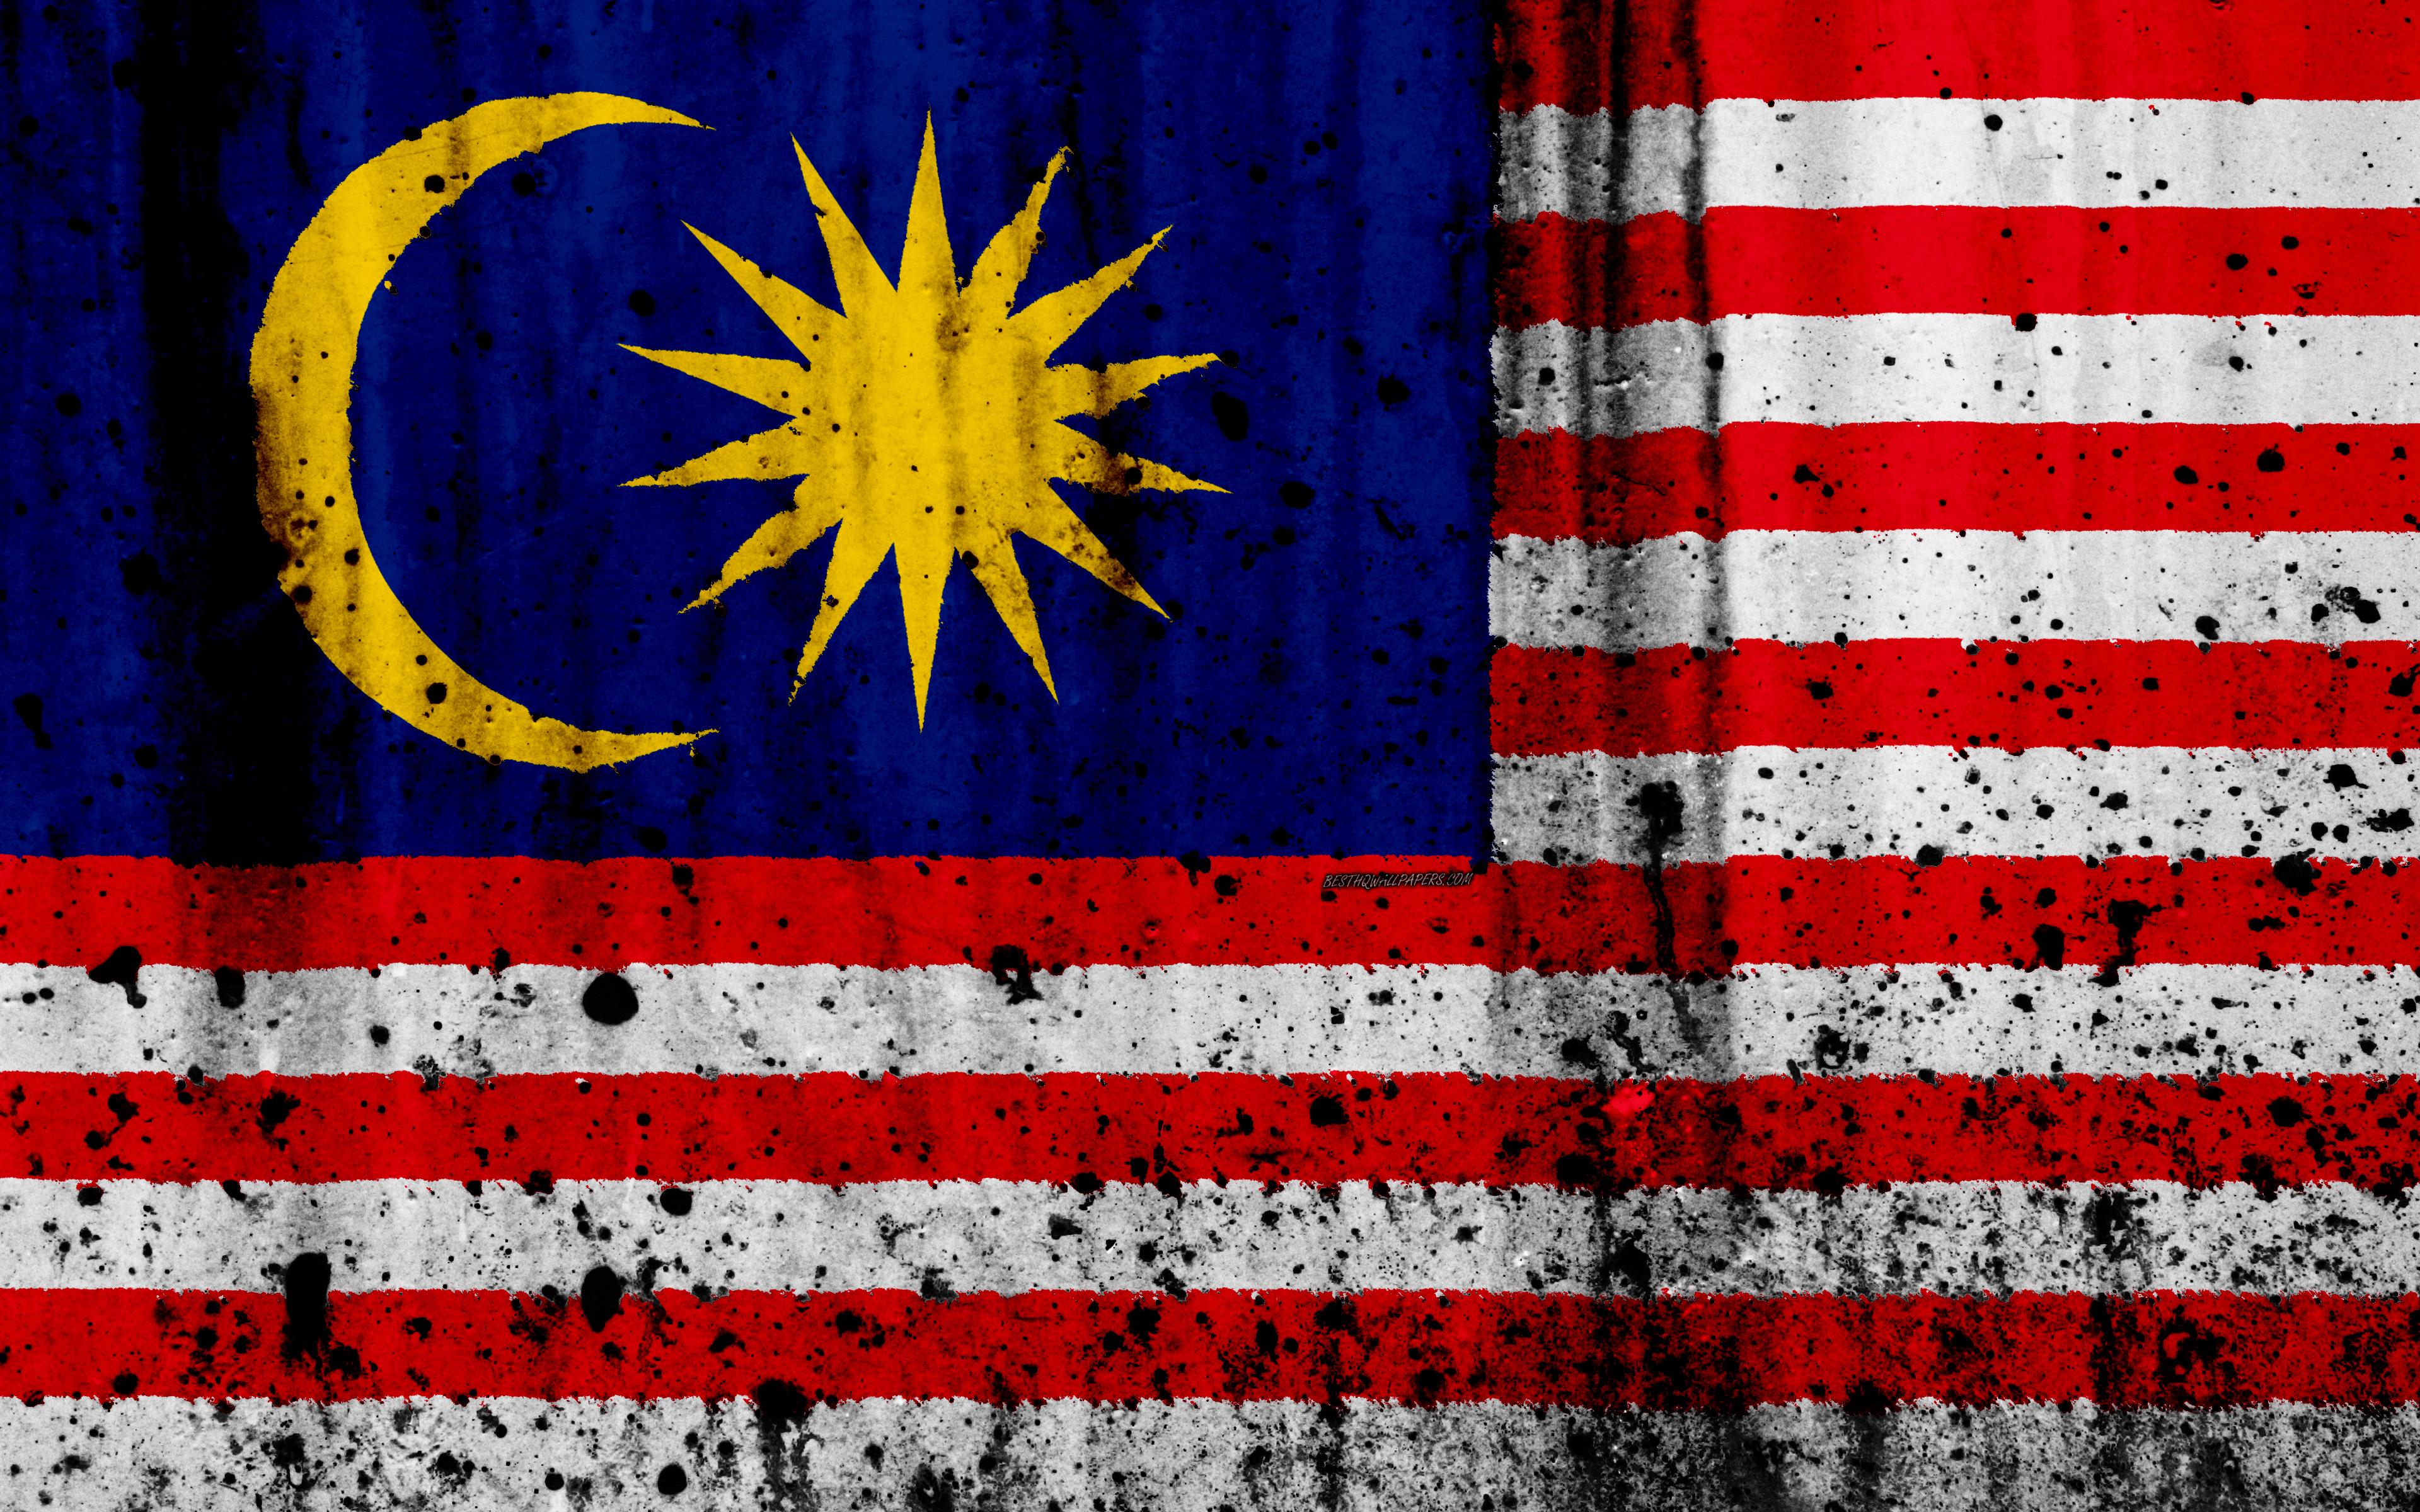 Download wallpapers Malaysian flag 4k grunge flag of Malaysia 3840x2400